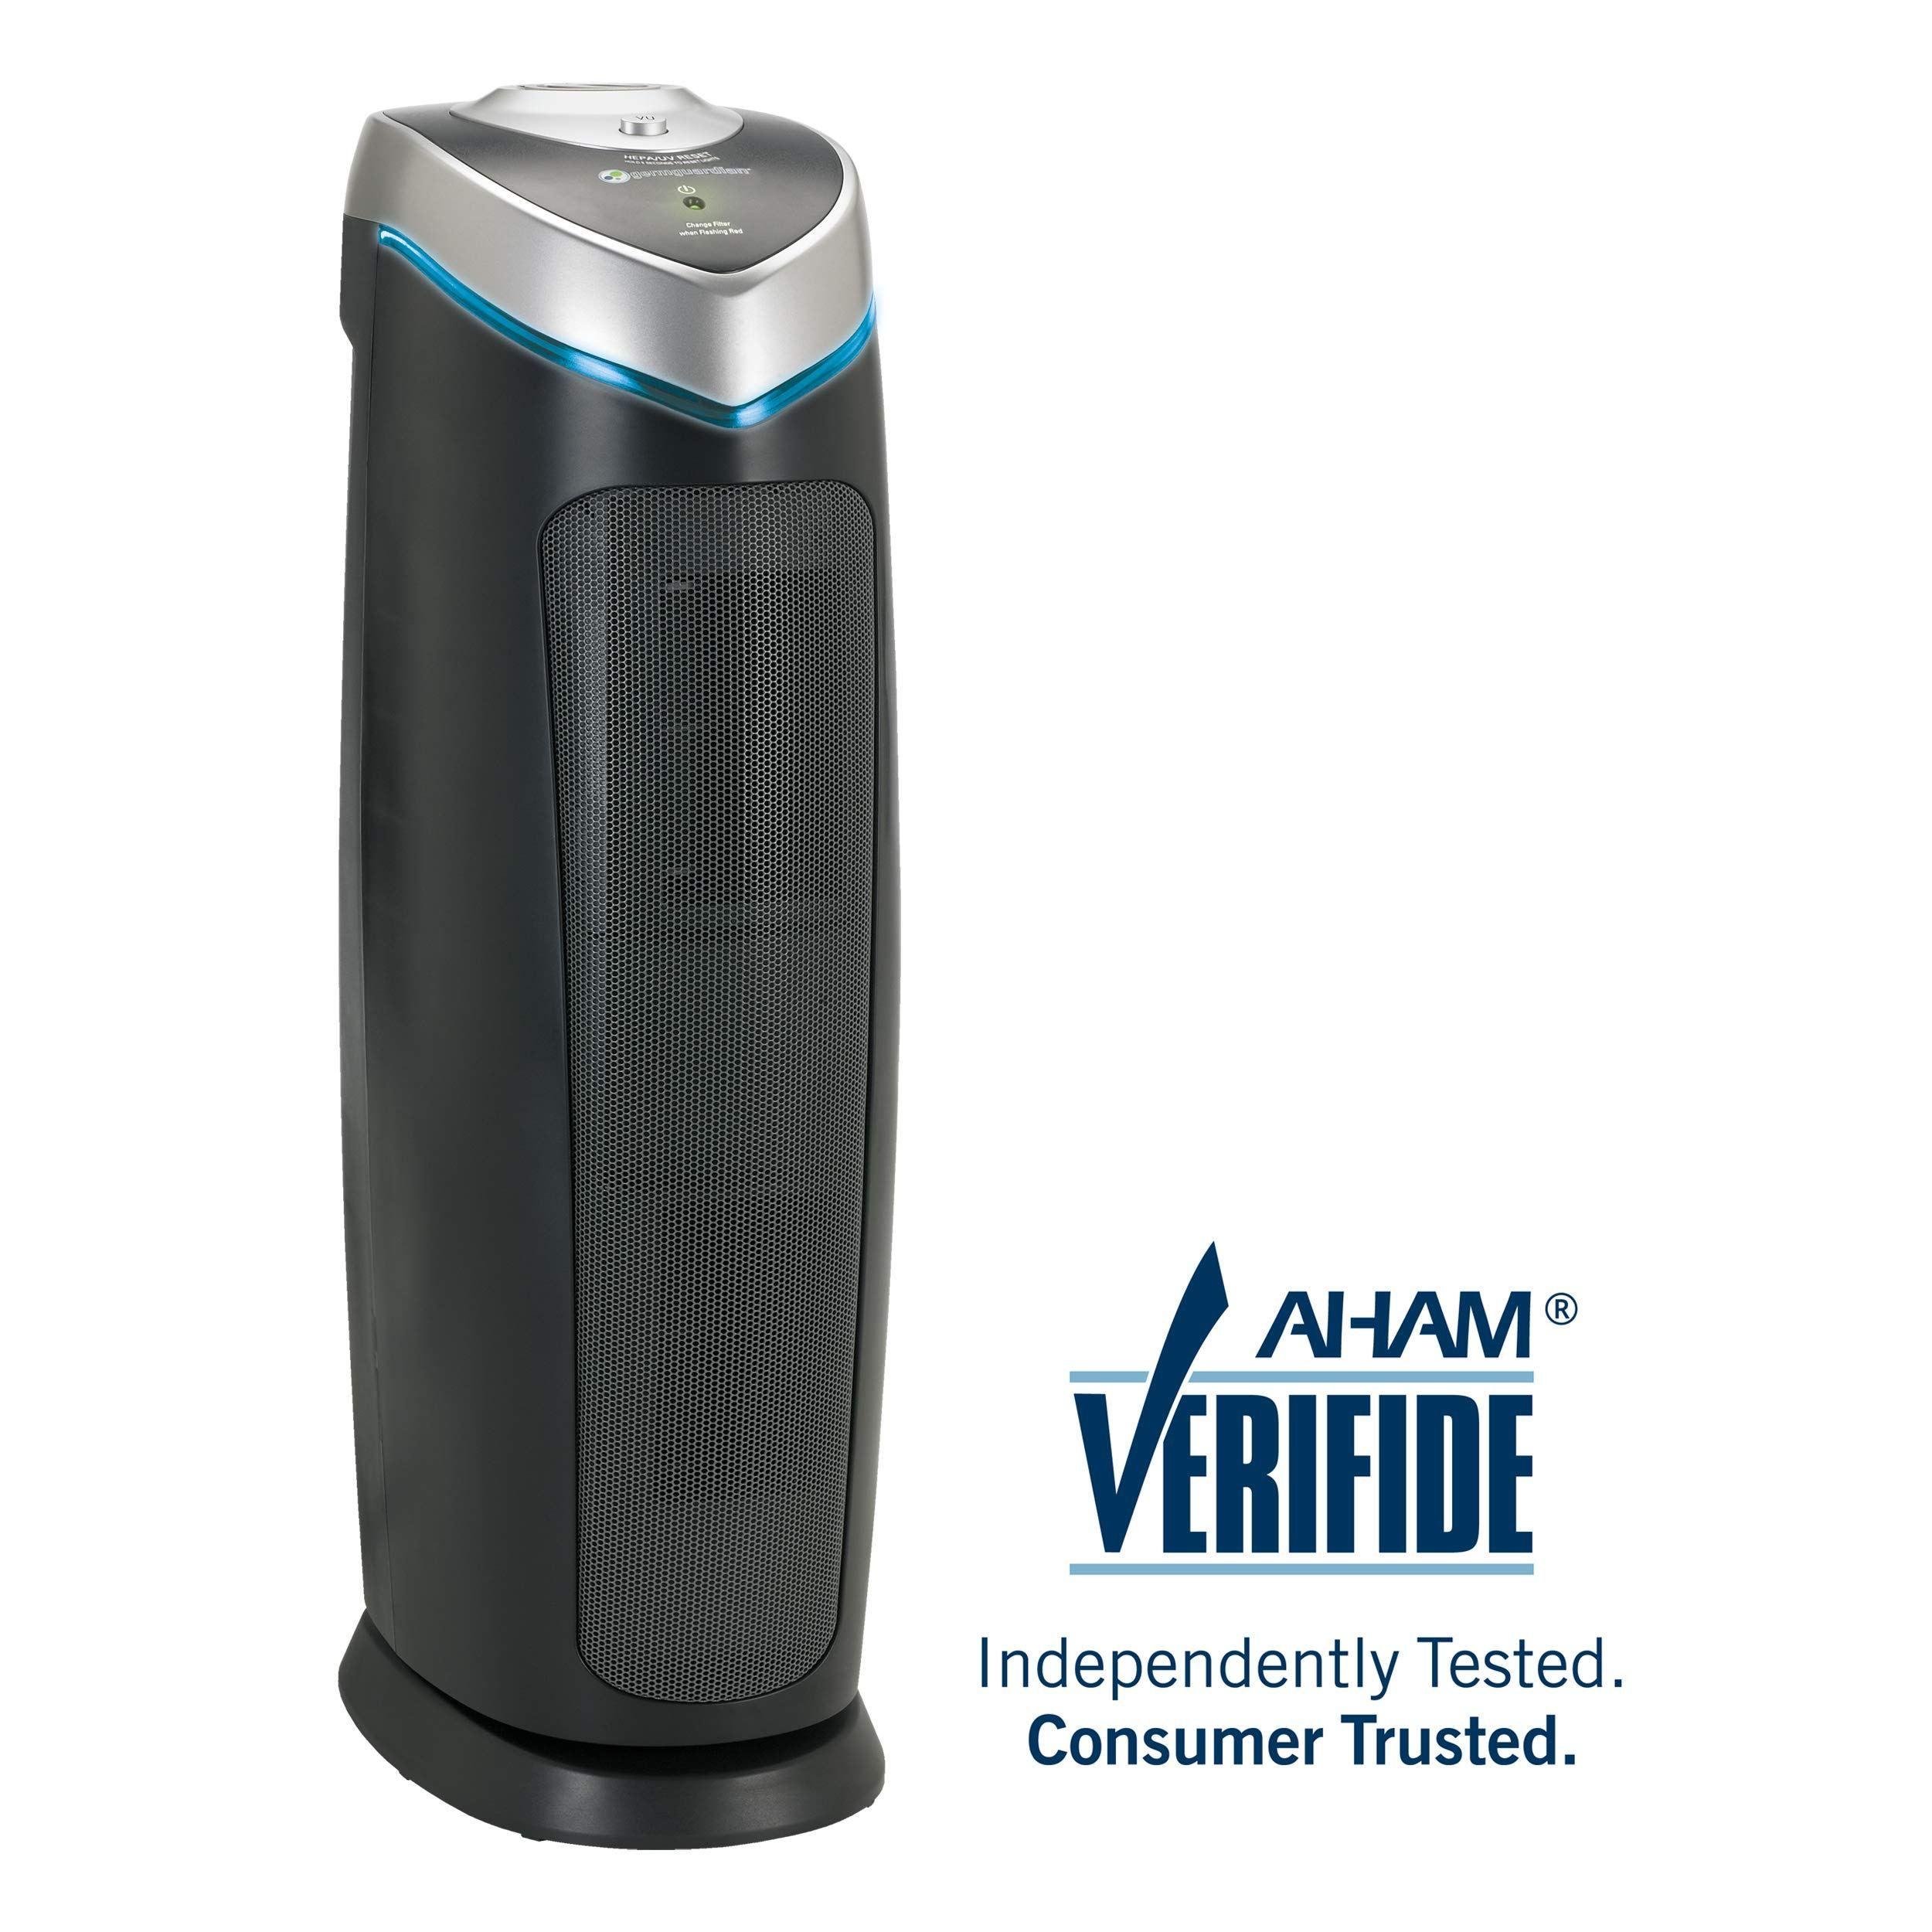 Germguardian Ac4825 22 3 In 1 Full Room Air Purifier Filter Air Purifier Hepa Air Purifier Air Purifier Allergies